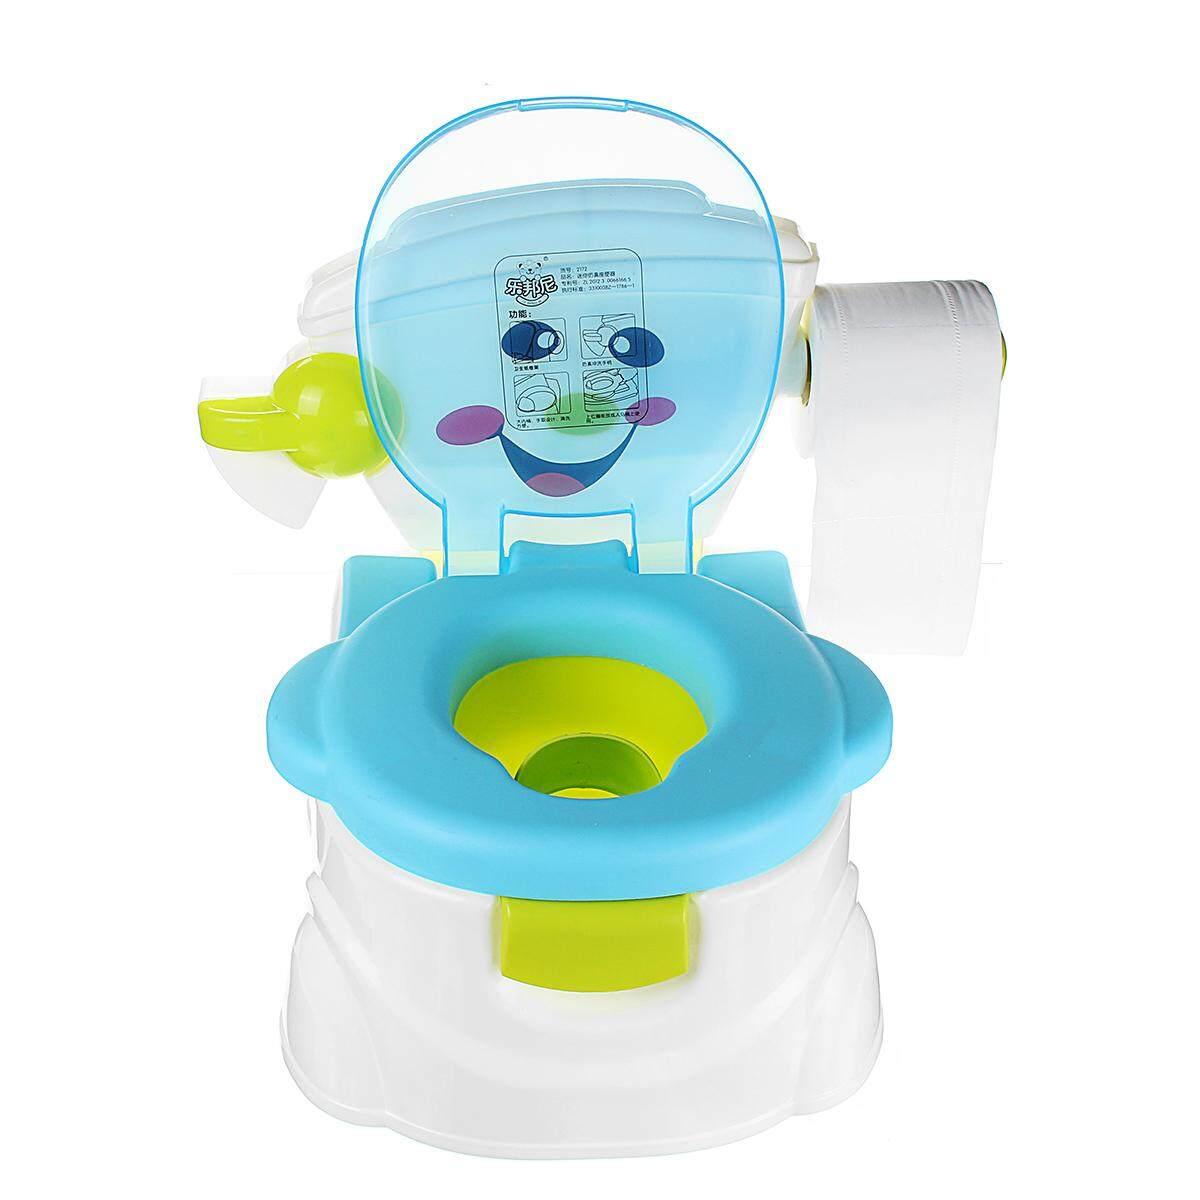 2 In 1 Musik Anak-anak Bayi Latihan Toilet Anak Balita Pelatih Toilet Kursi